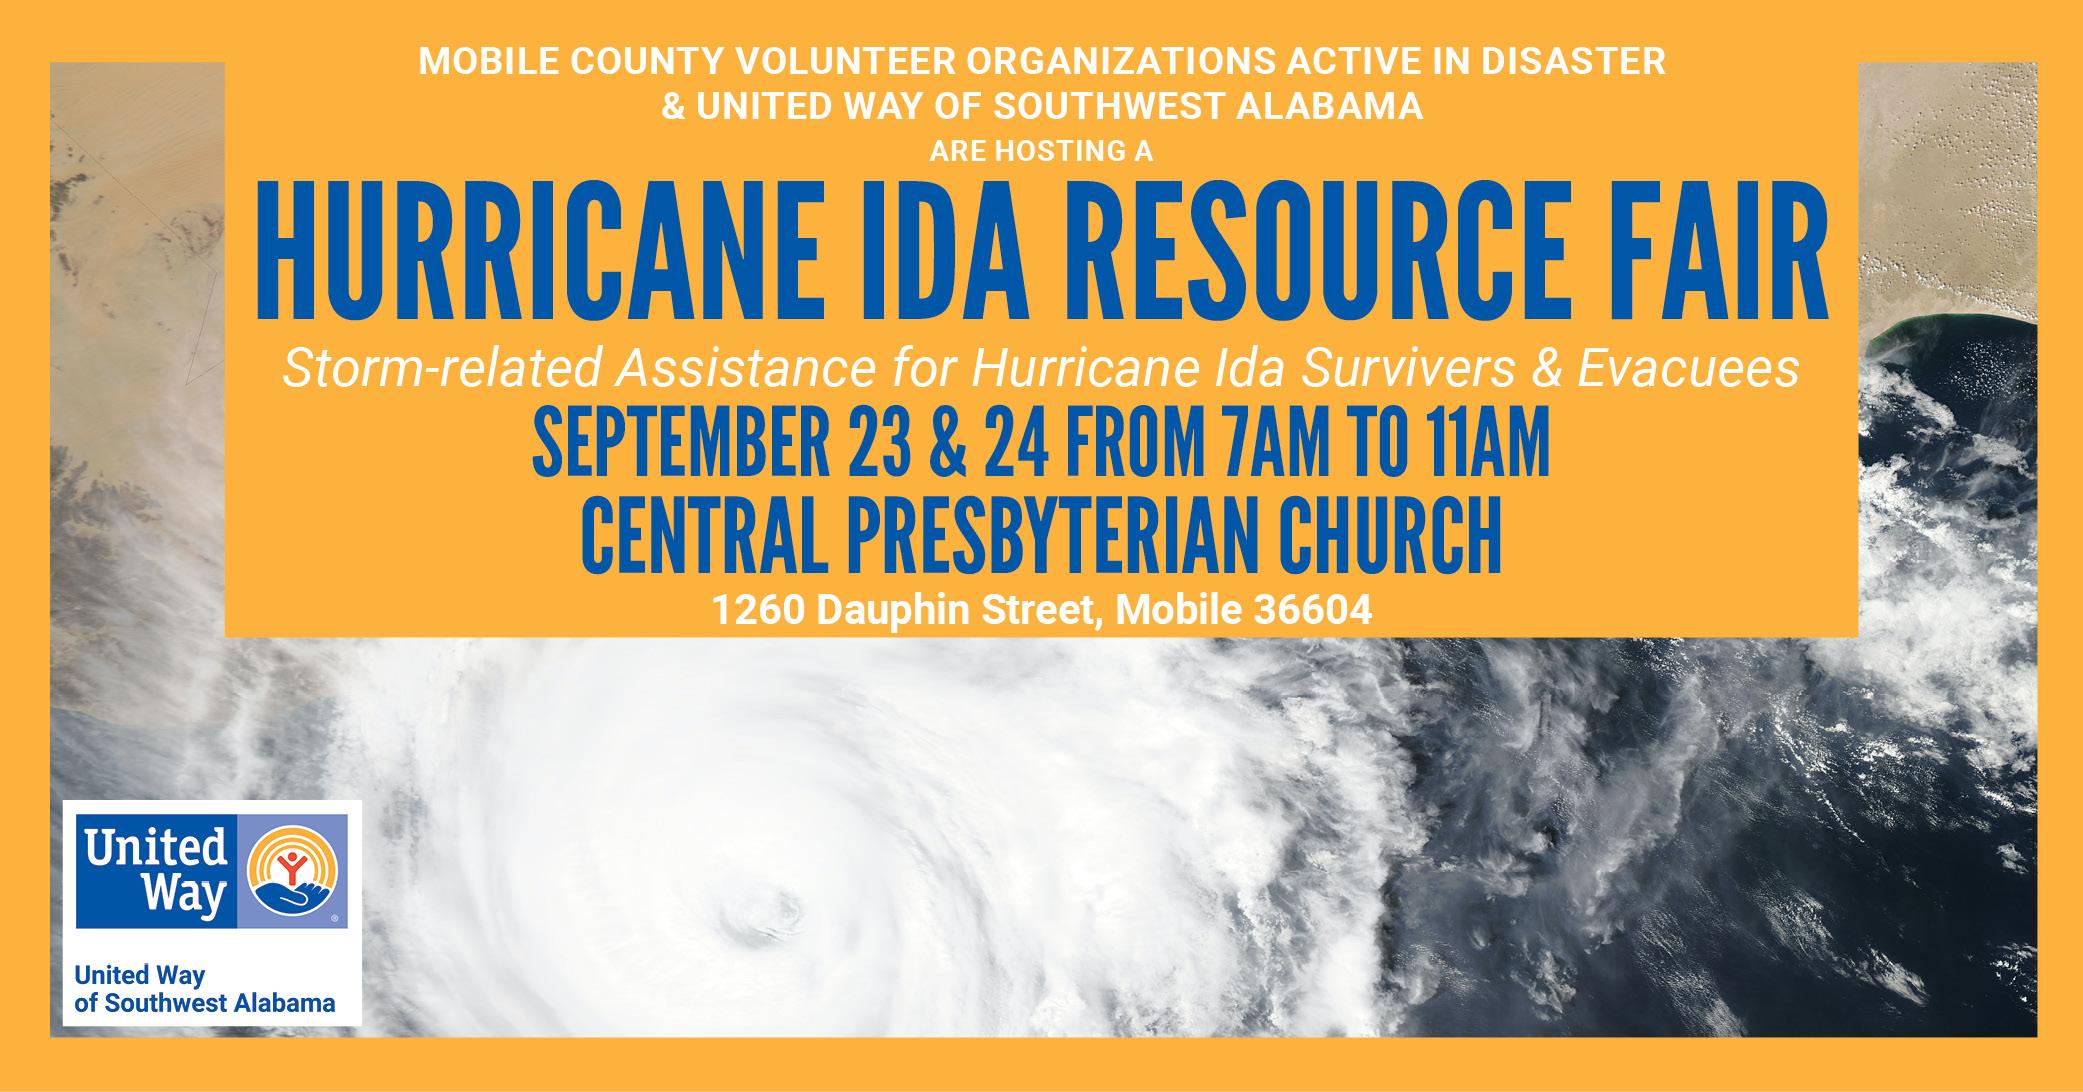 Hurricane Ida Resource Fair